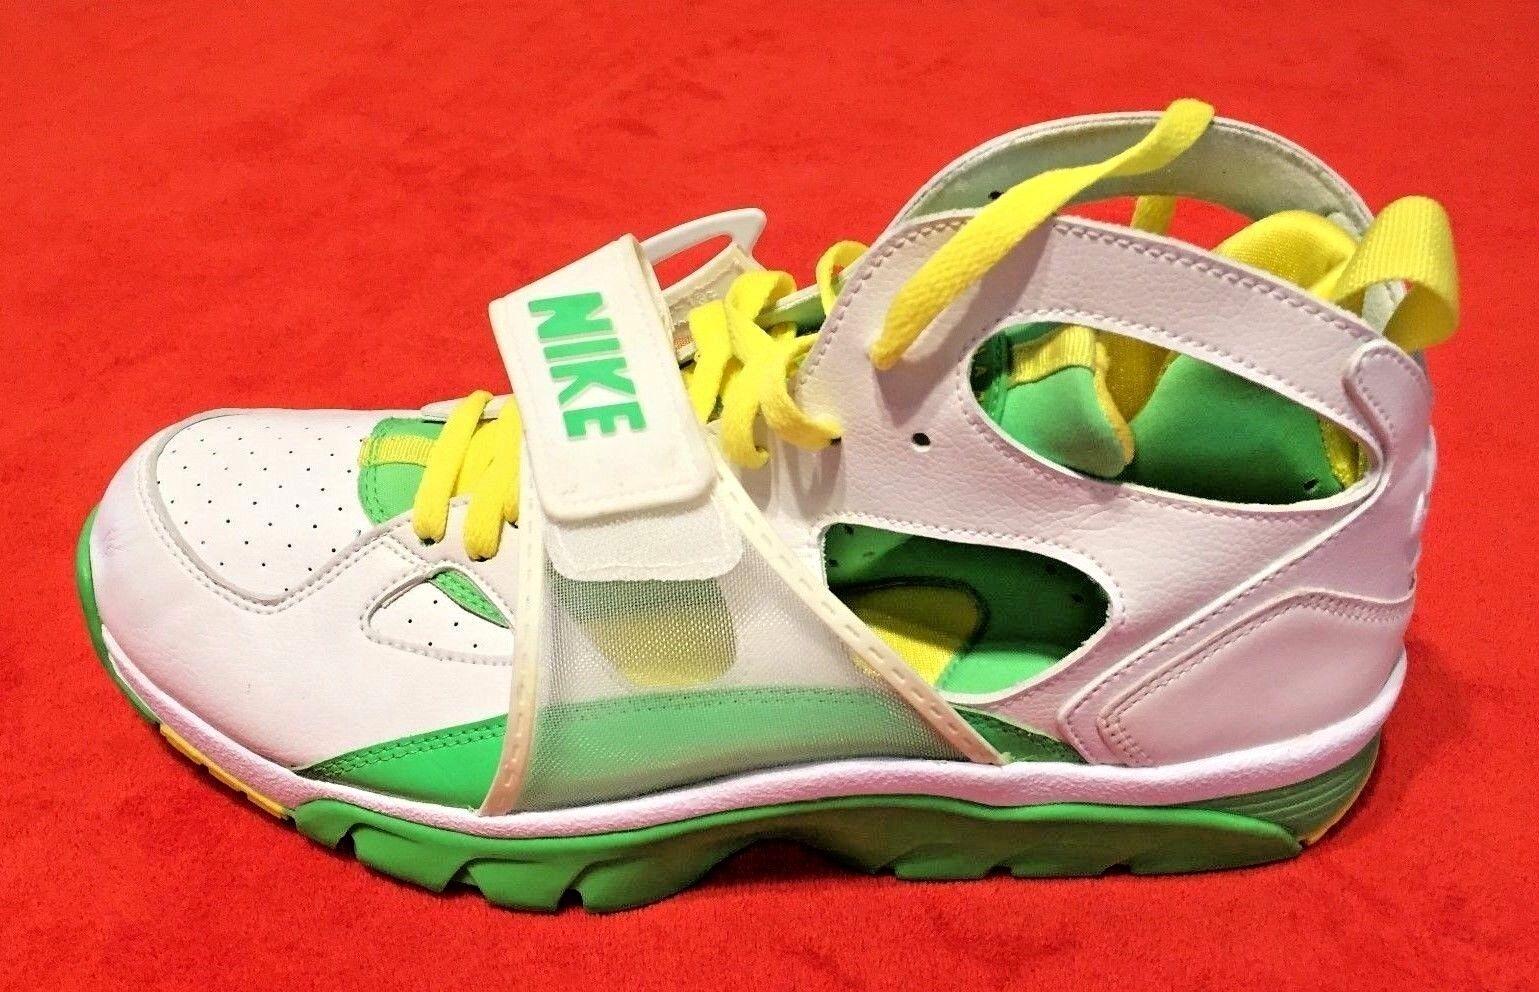 Nike weiß, ledersneaker grün und gelb männer air huarache ledersneaker weiß, schuhe der größe 12 dc9117